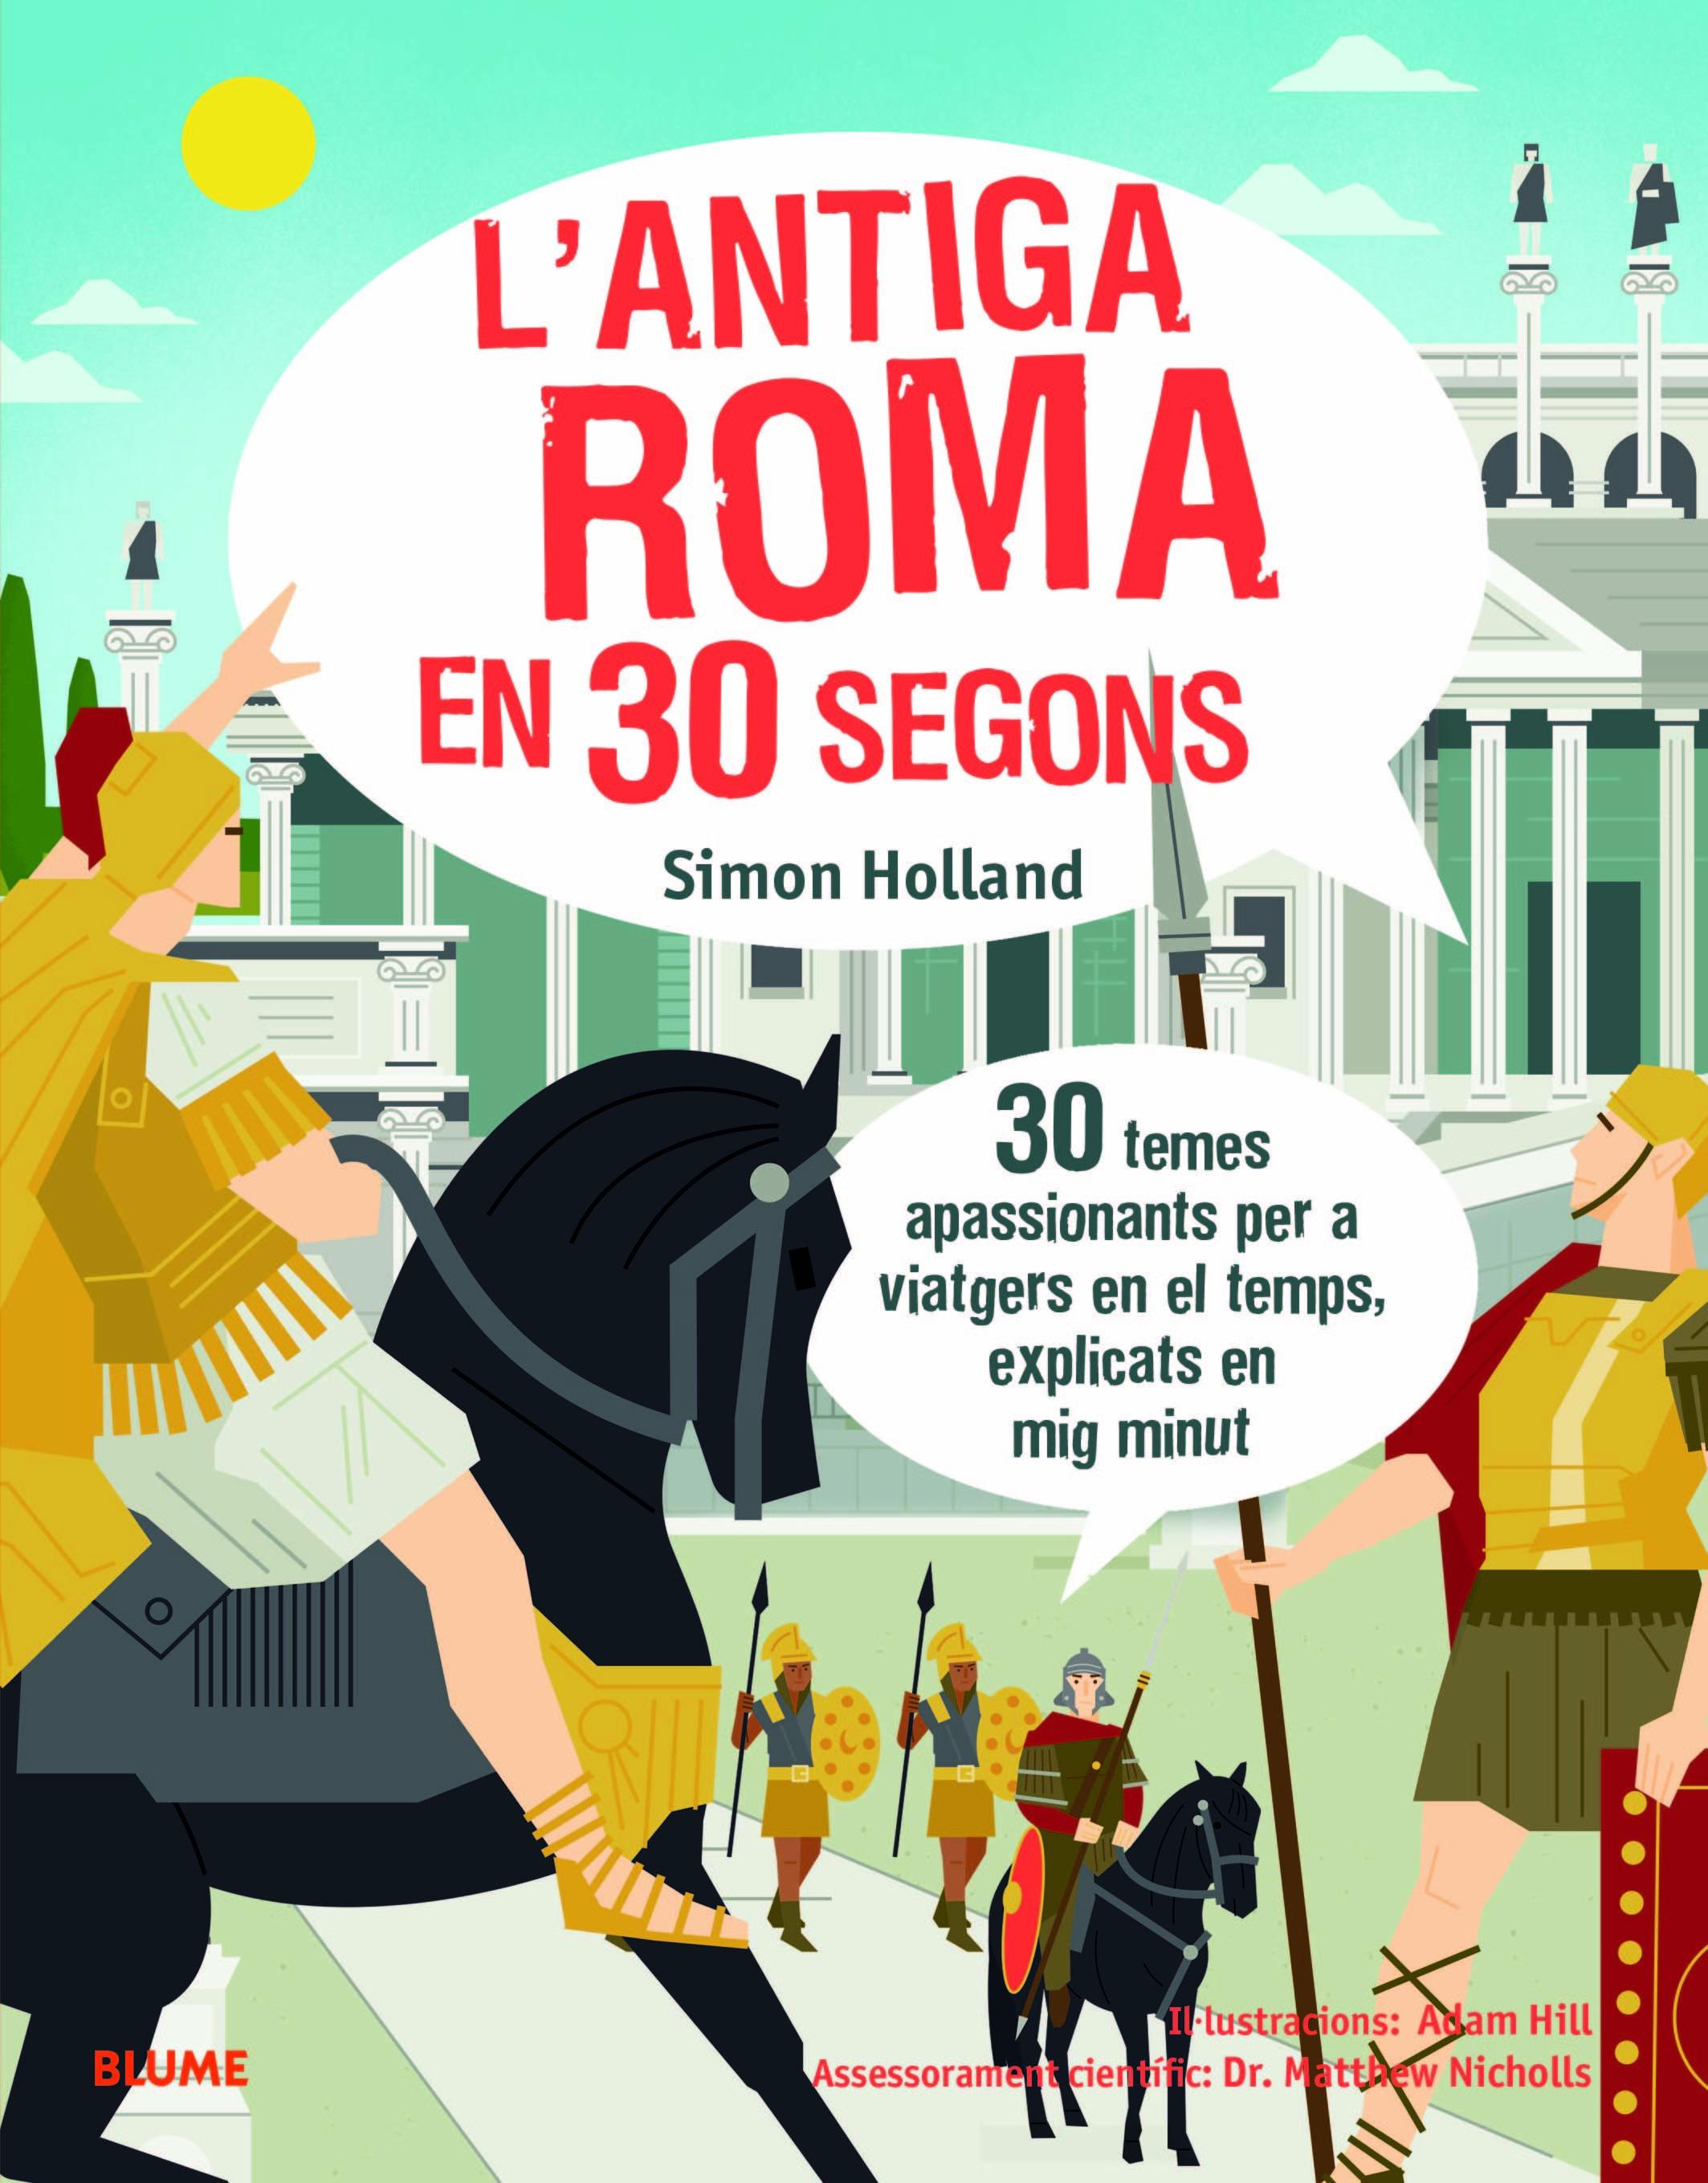 ANTIGA ROMA EN 30 SEGONS